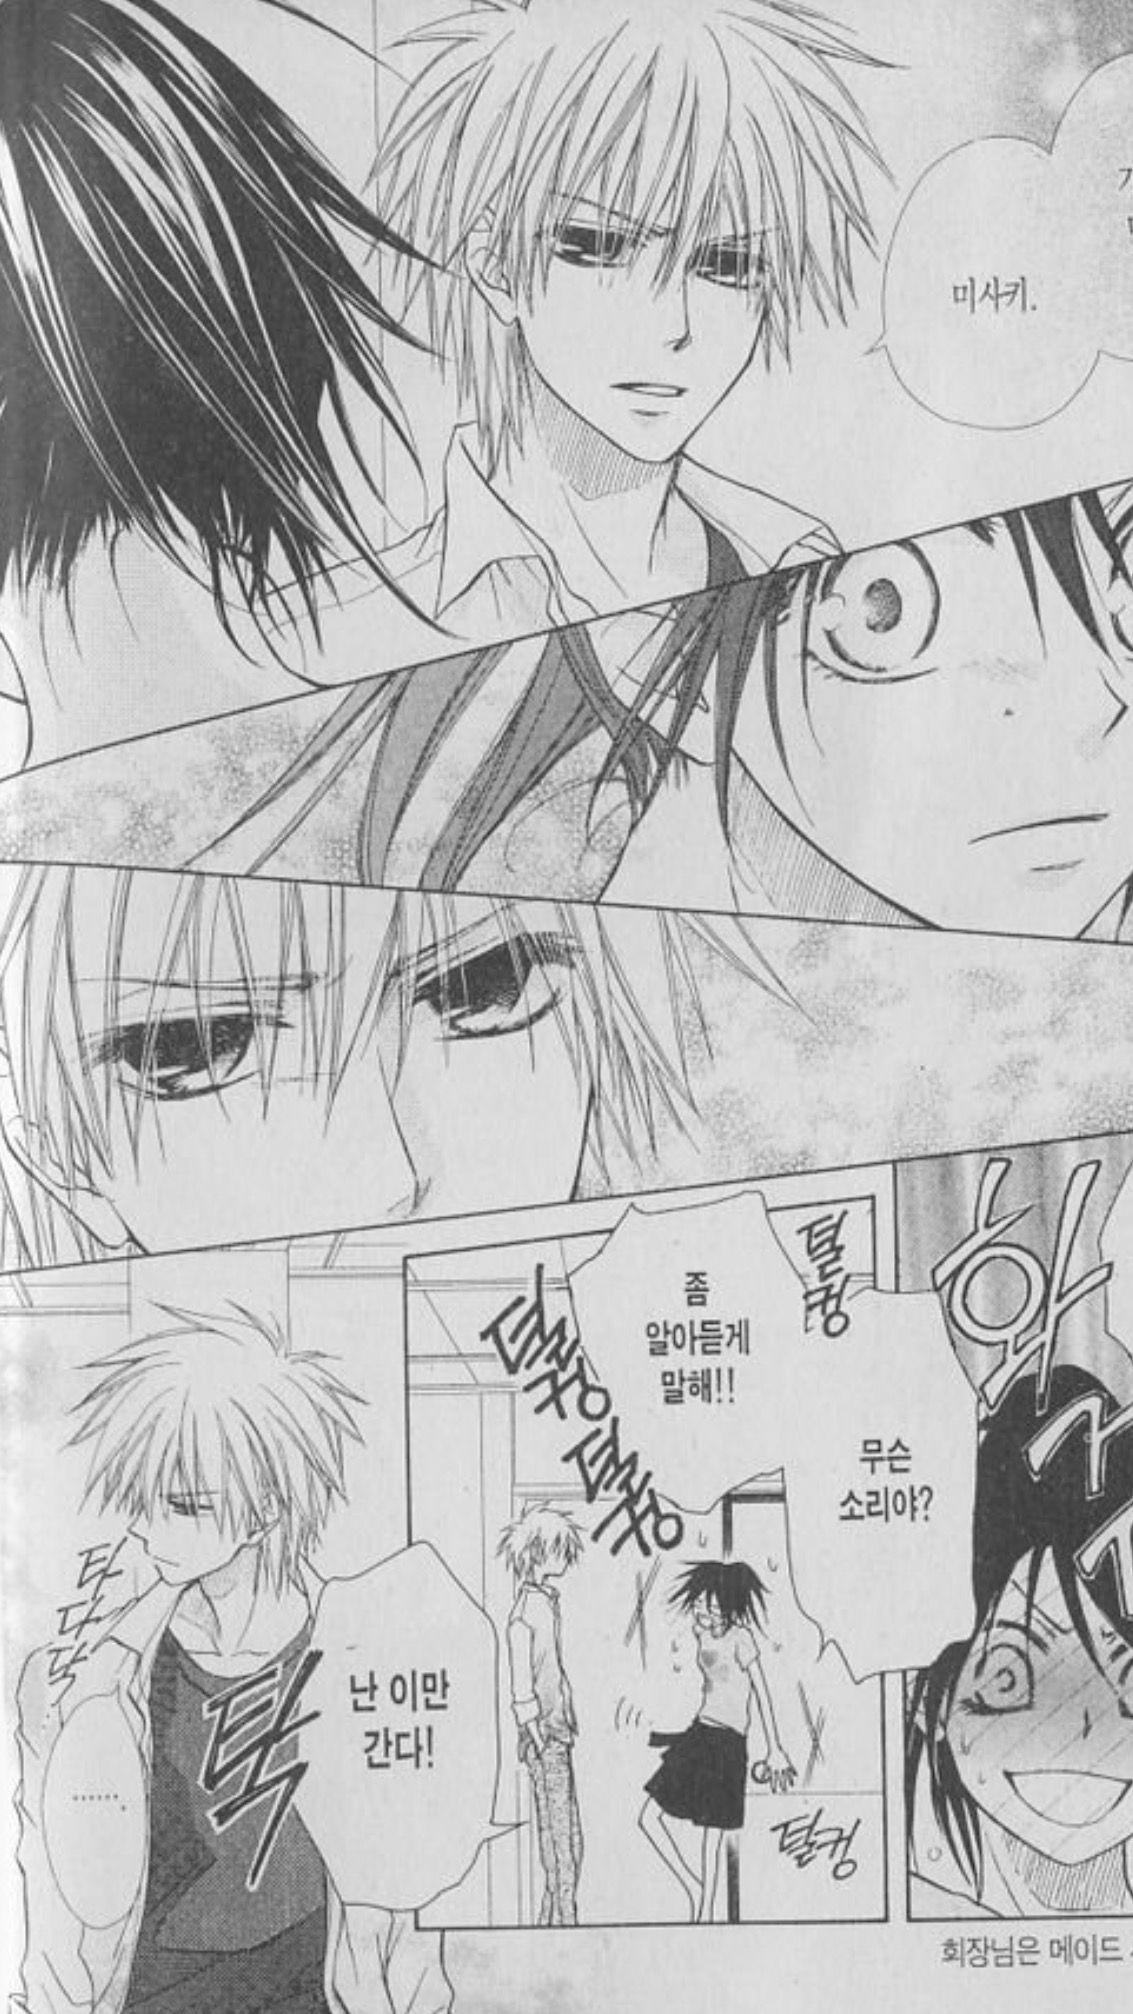 Pin by Layla on Manga Romantic comedy anime, Best